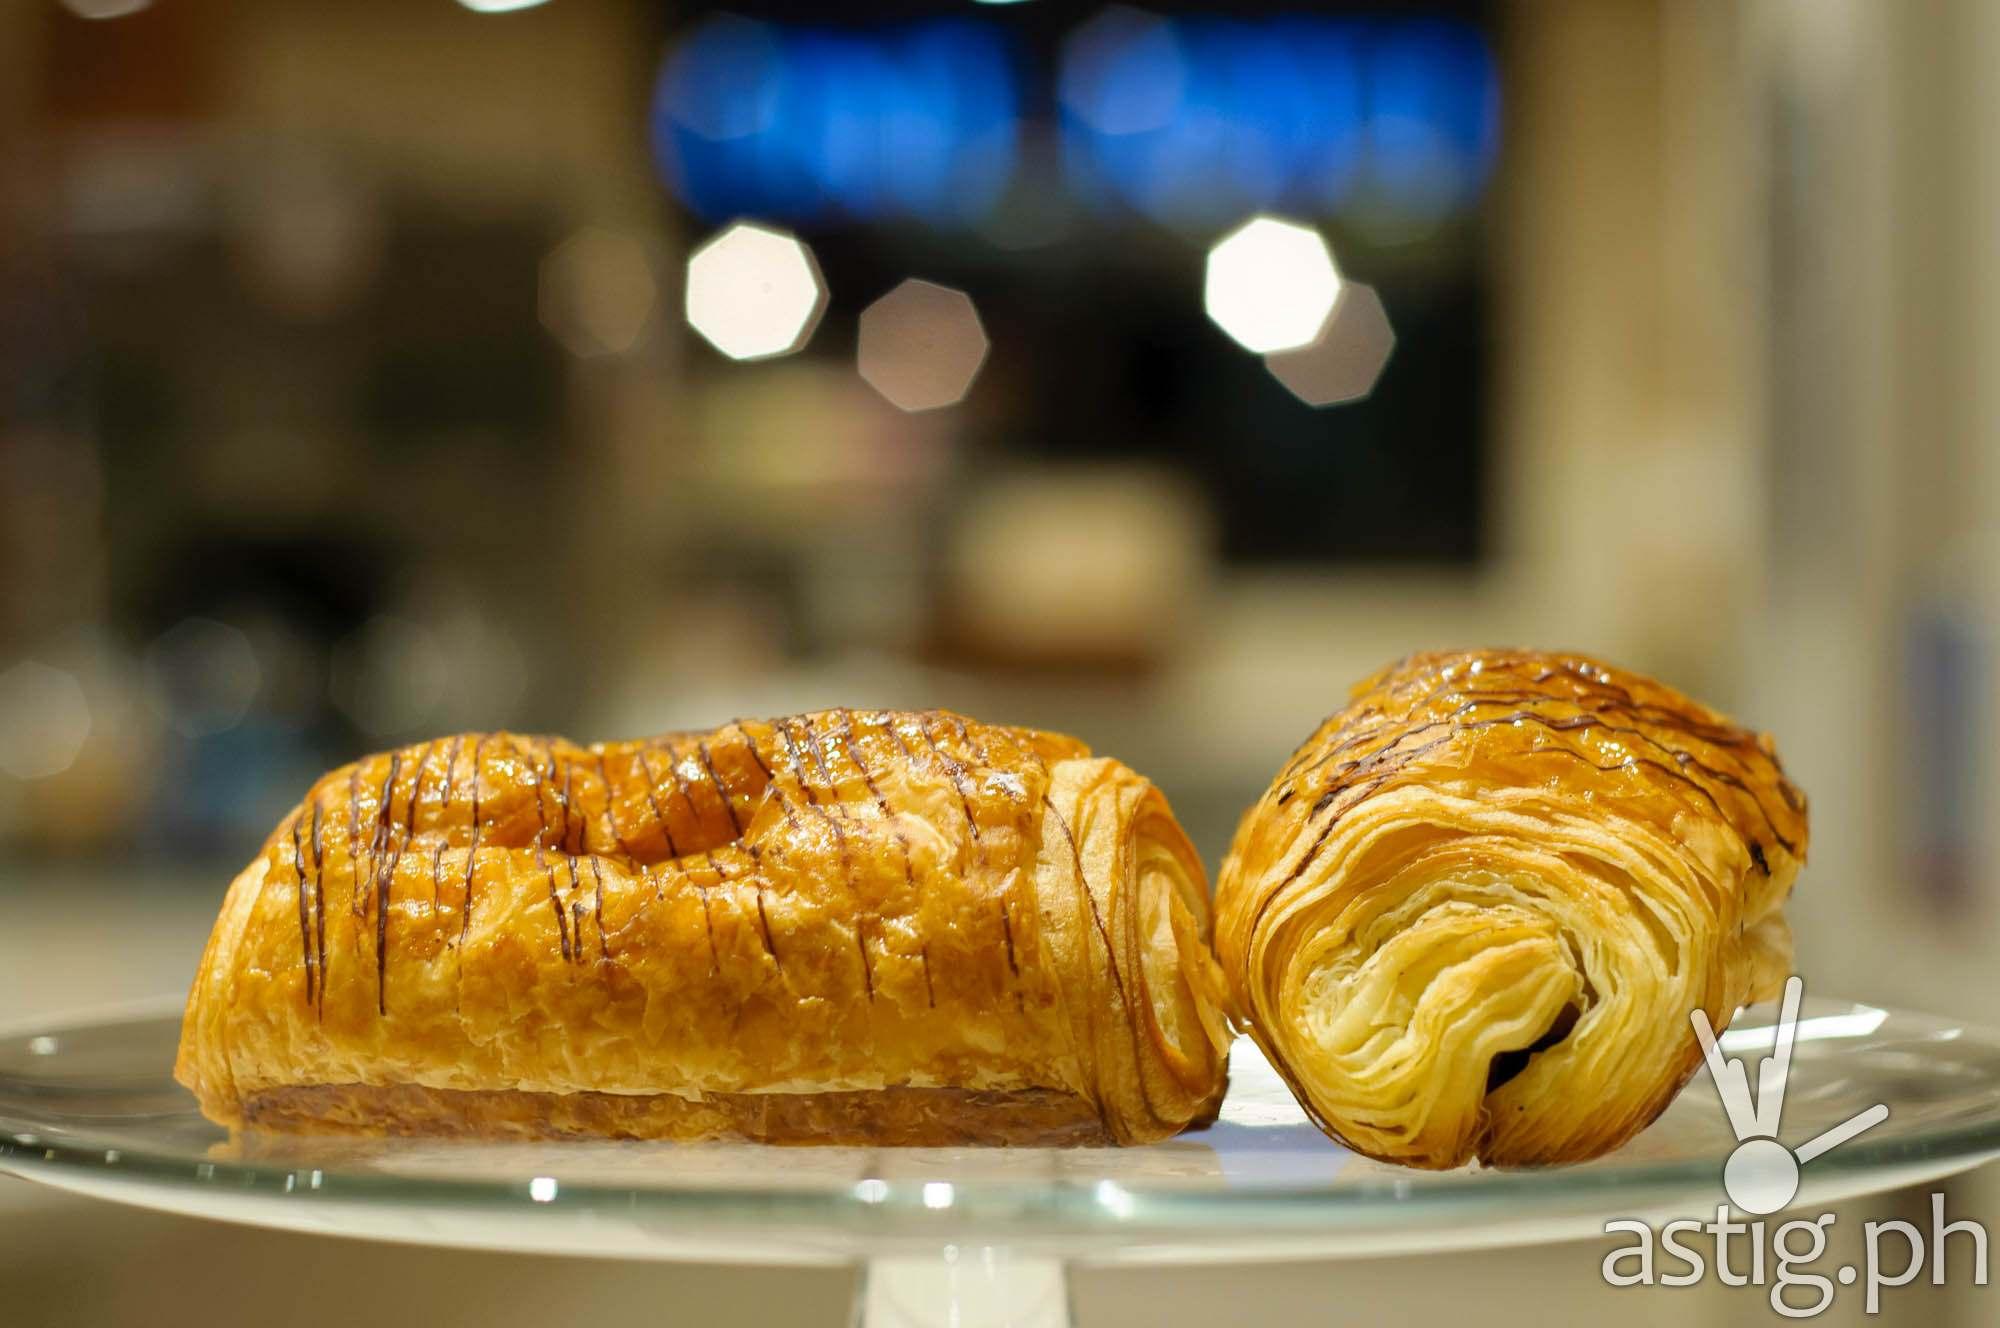 Chocolate Croissant (P110) - Crema at Marriott Grand Ballroom